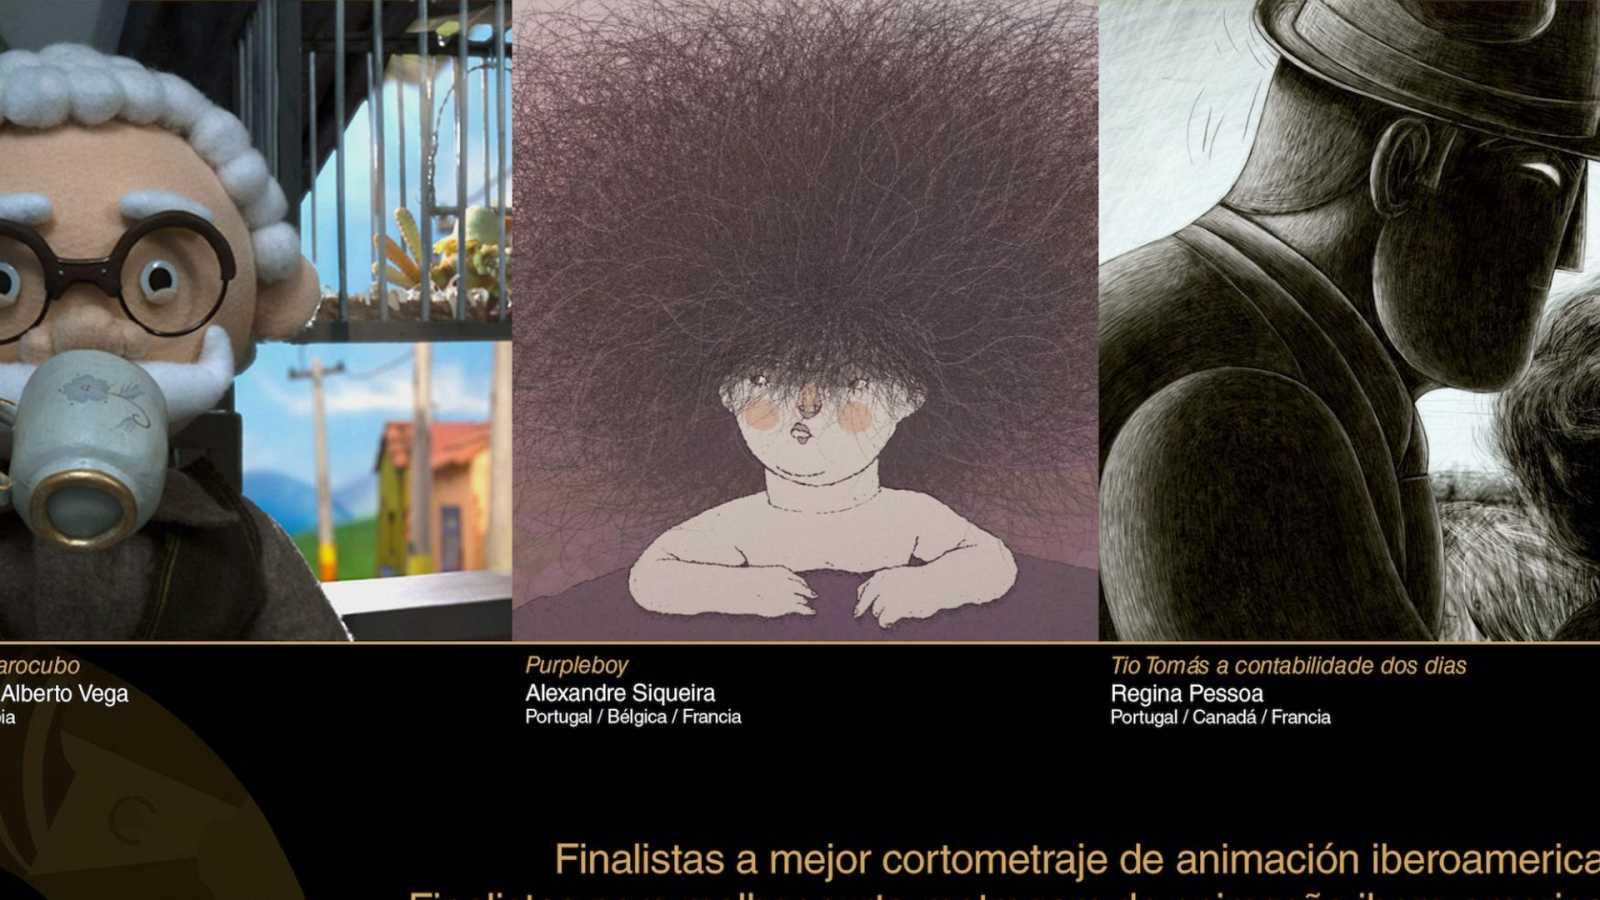 De cine - Mes Quirino de la Animación Iberoamericana - 01/06/20 - Escuchar ahora